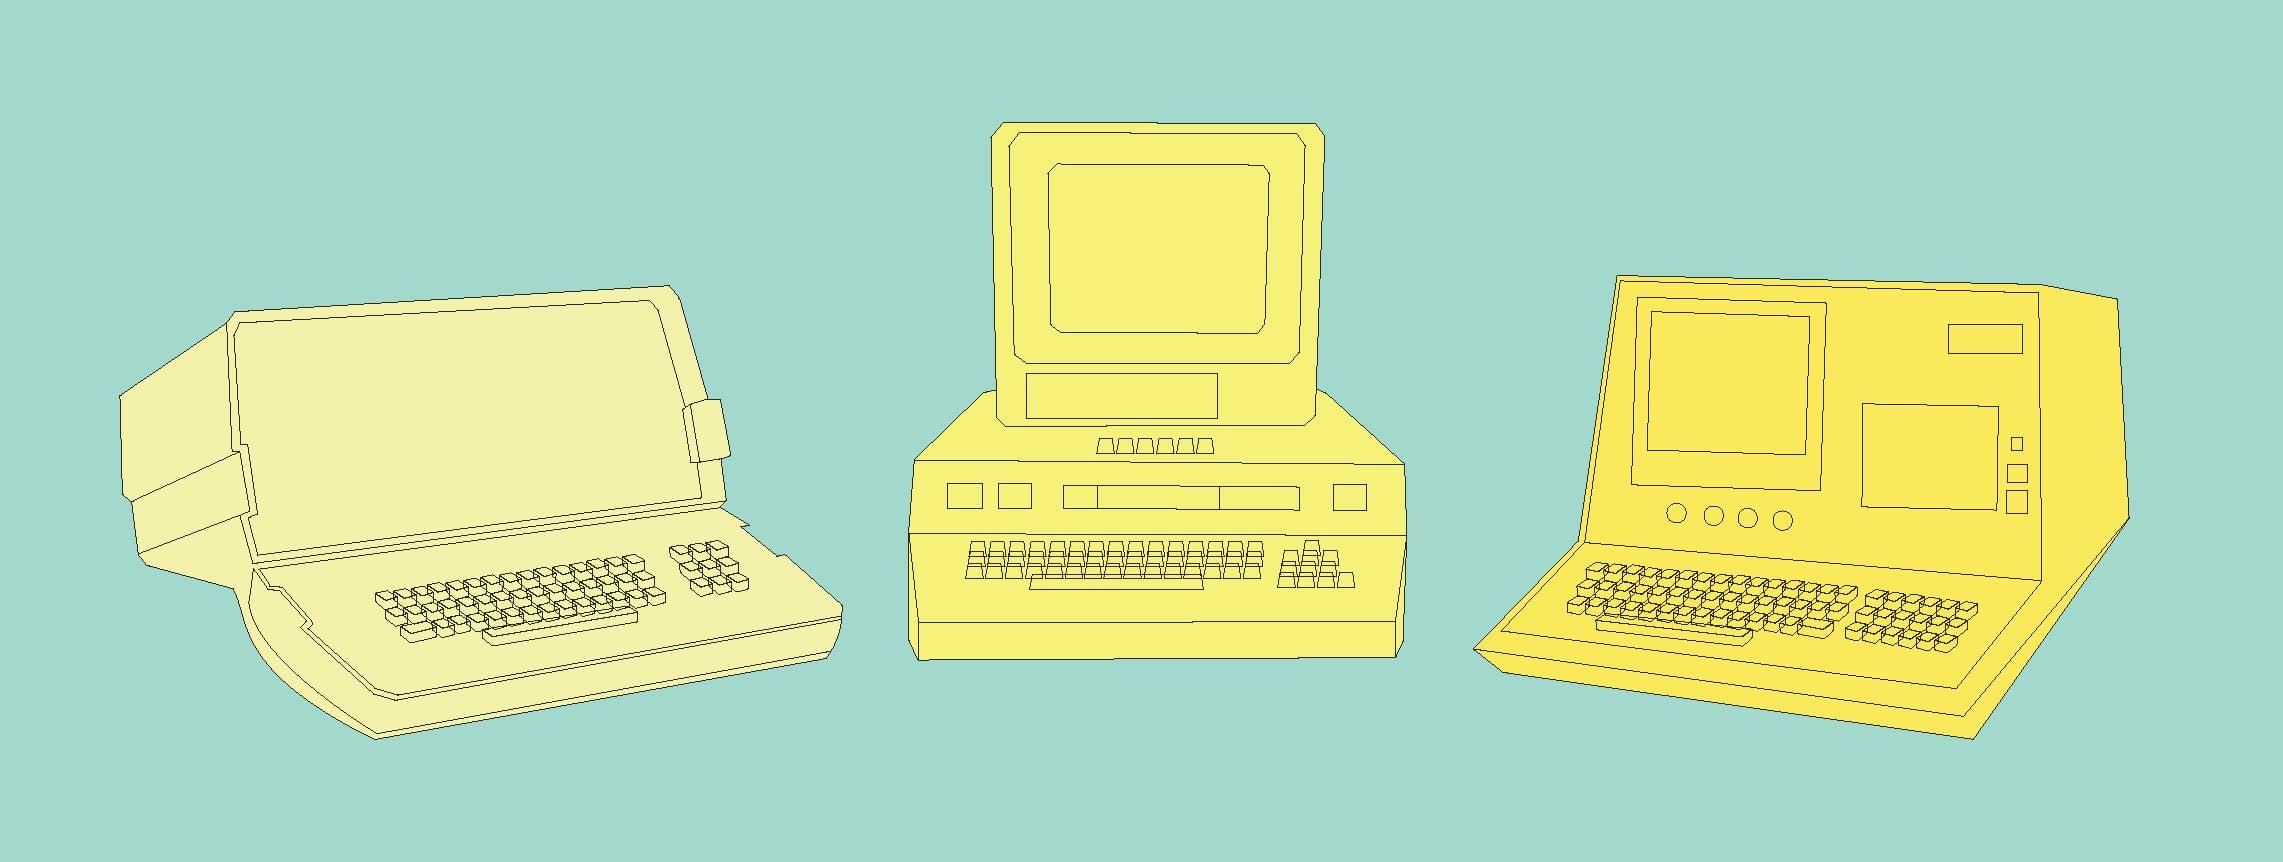 Retro Computers | Sallie Harrison Design Studio